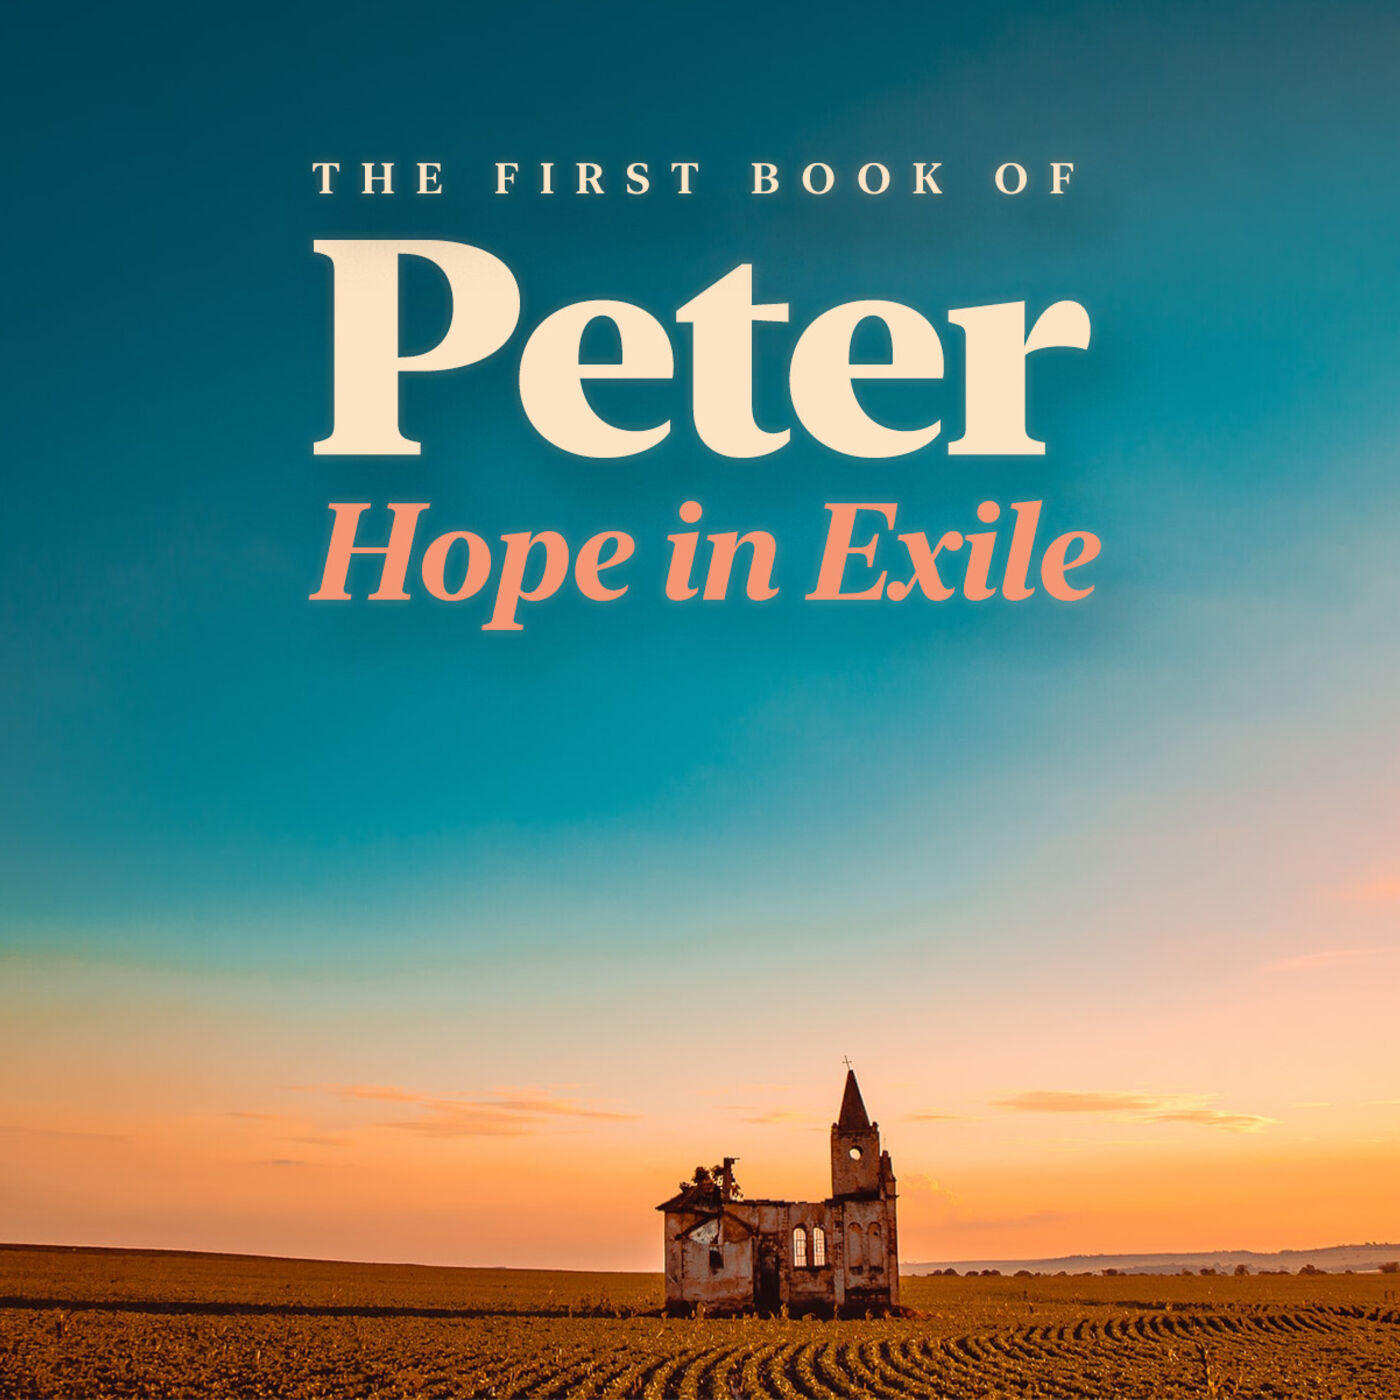 1 Peter 2:13 - 3:12 | Pastor Dale Stinson